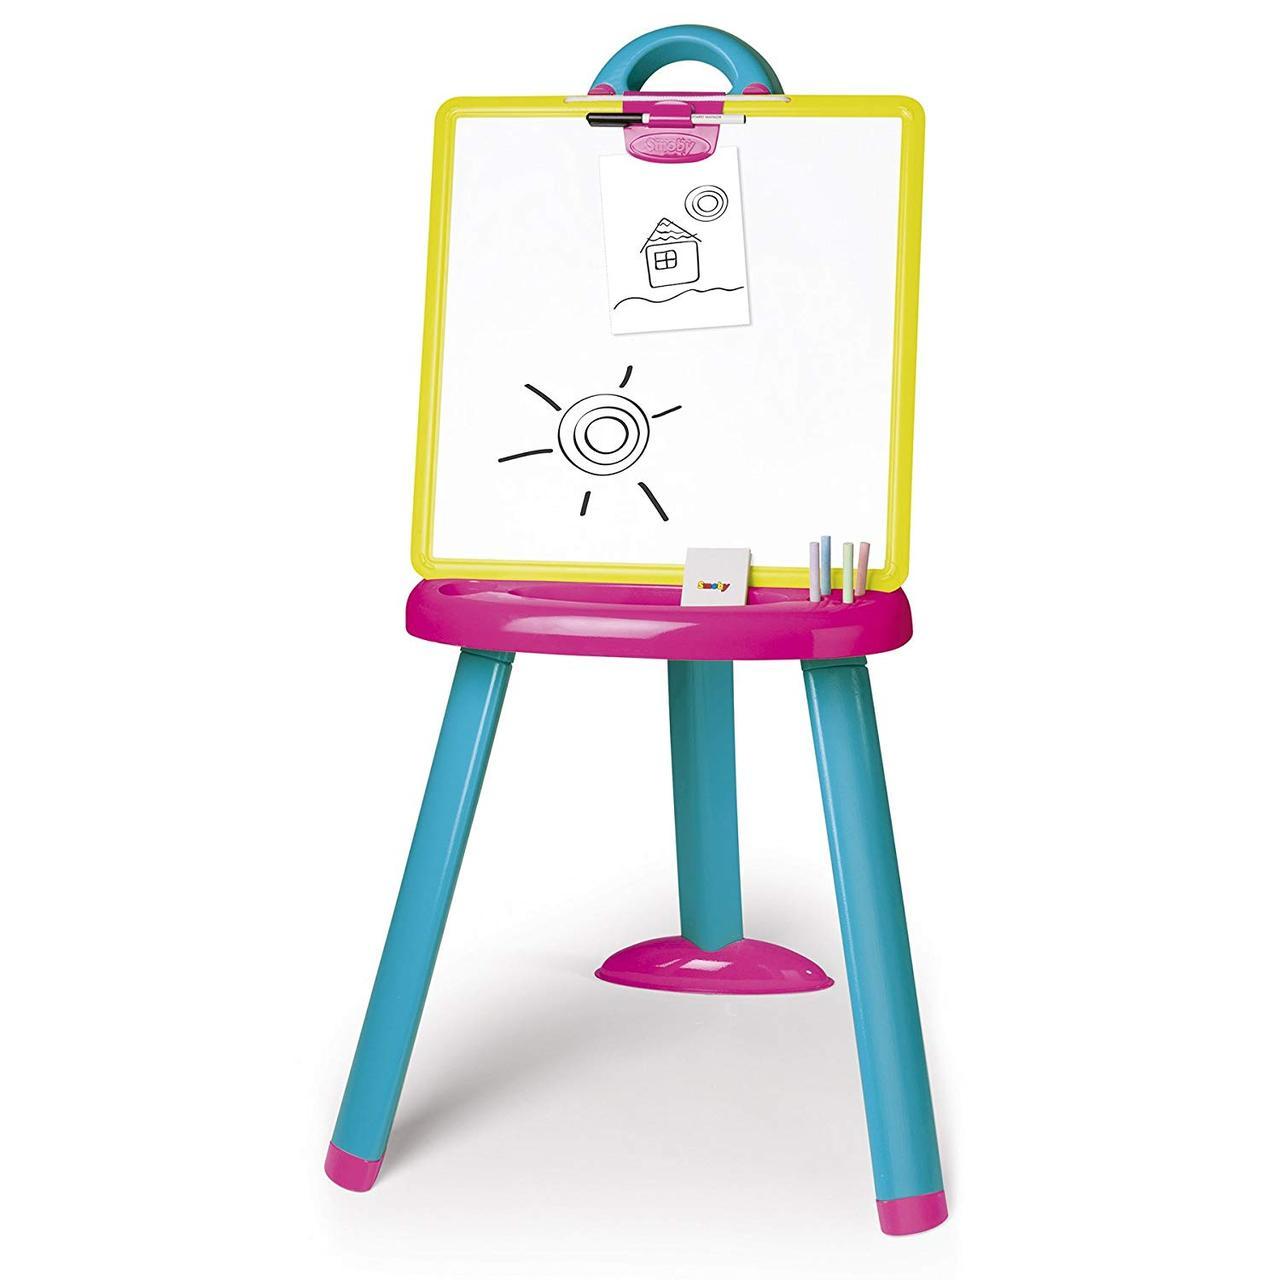 Мольберт двусторонний для рисования со съемной доской и аксессуарами розово-синий Smoby 410608